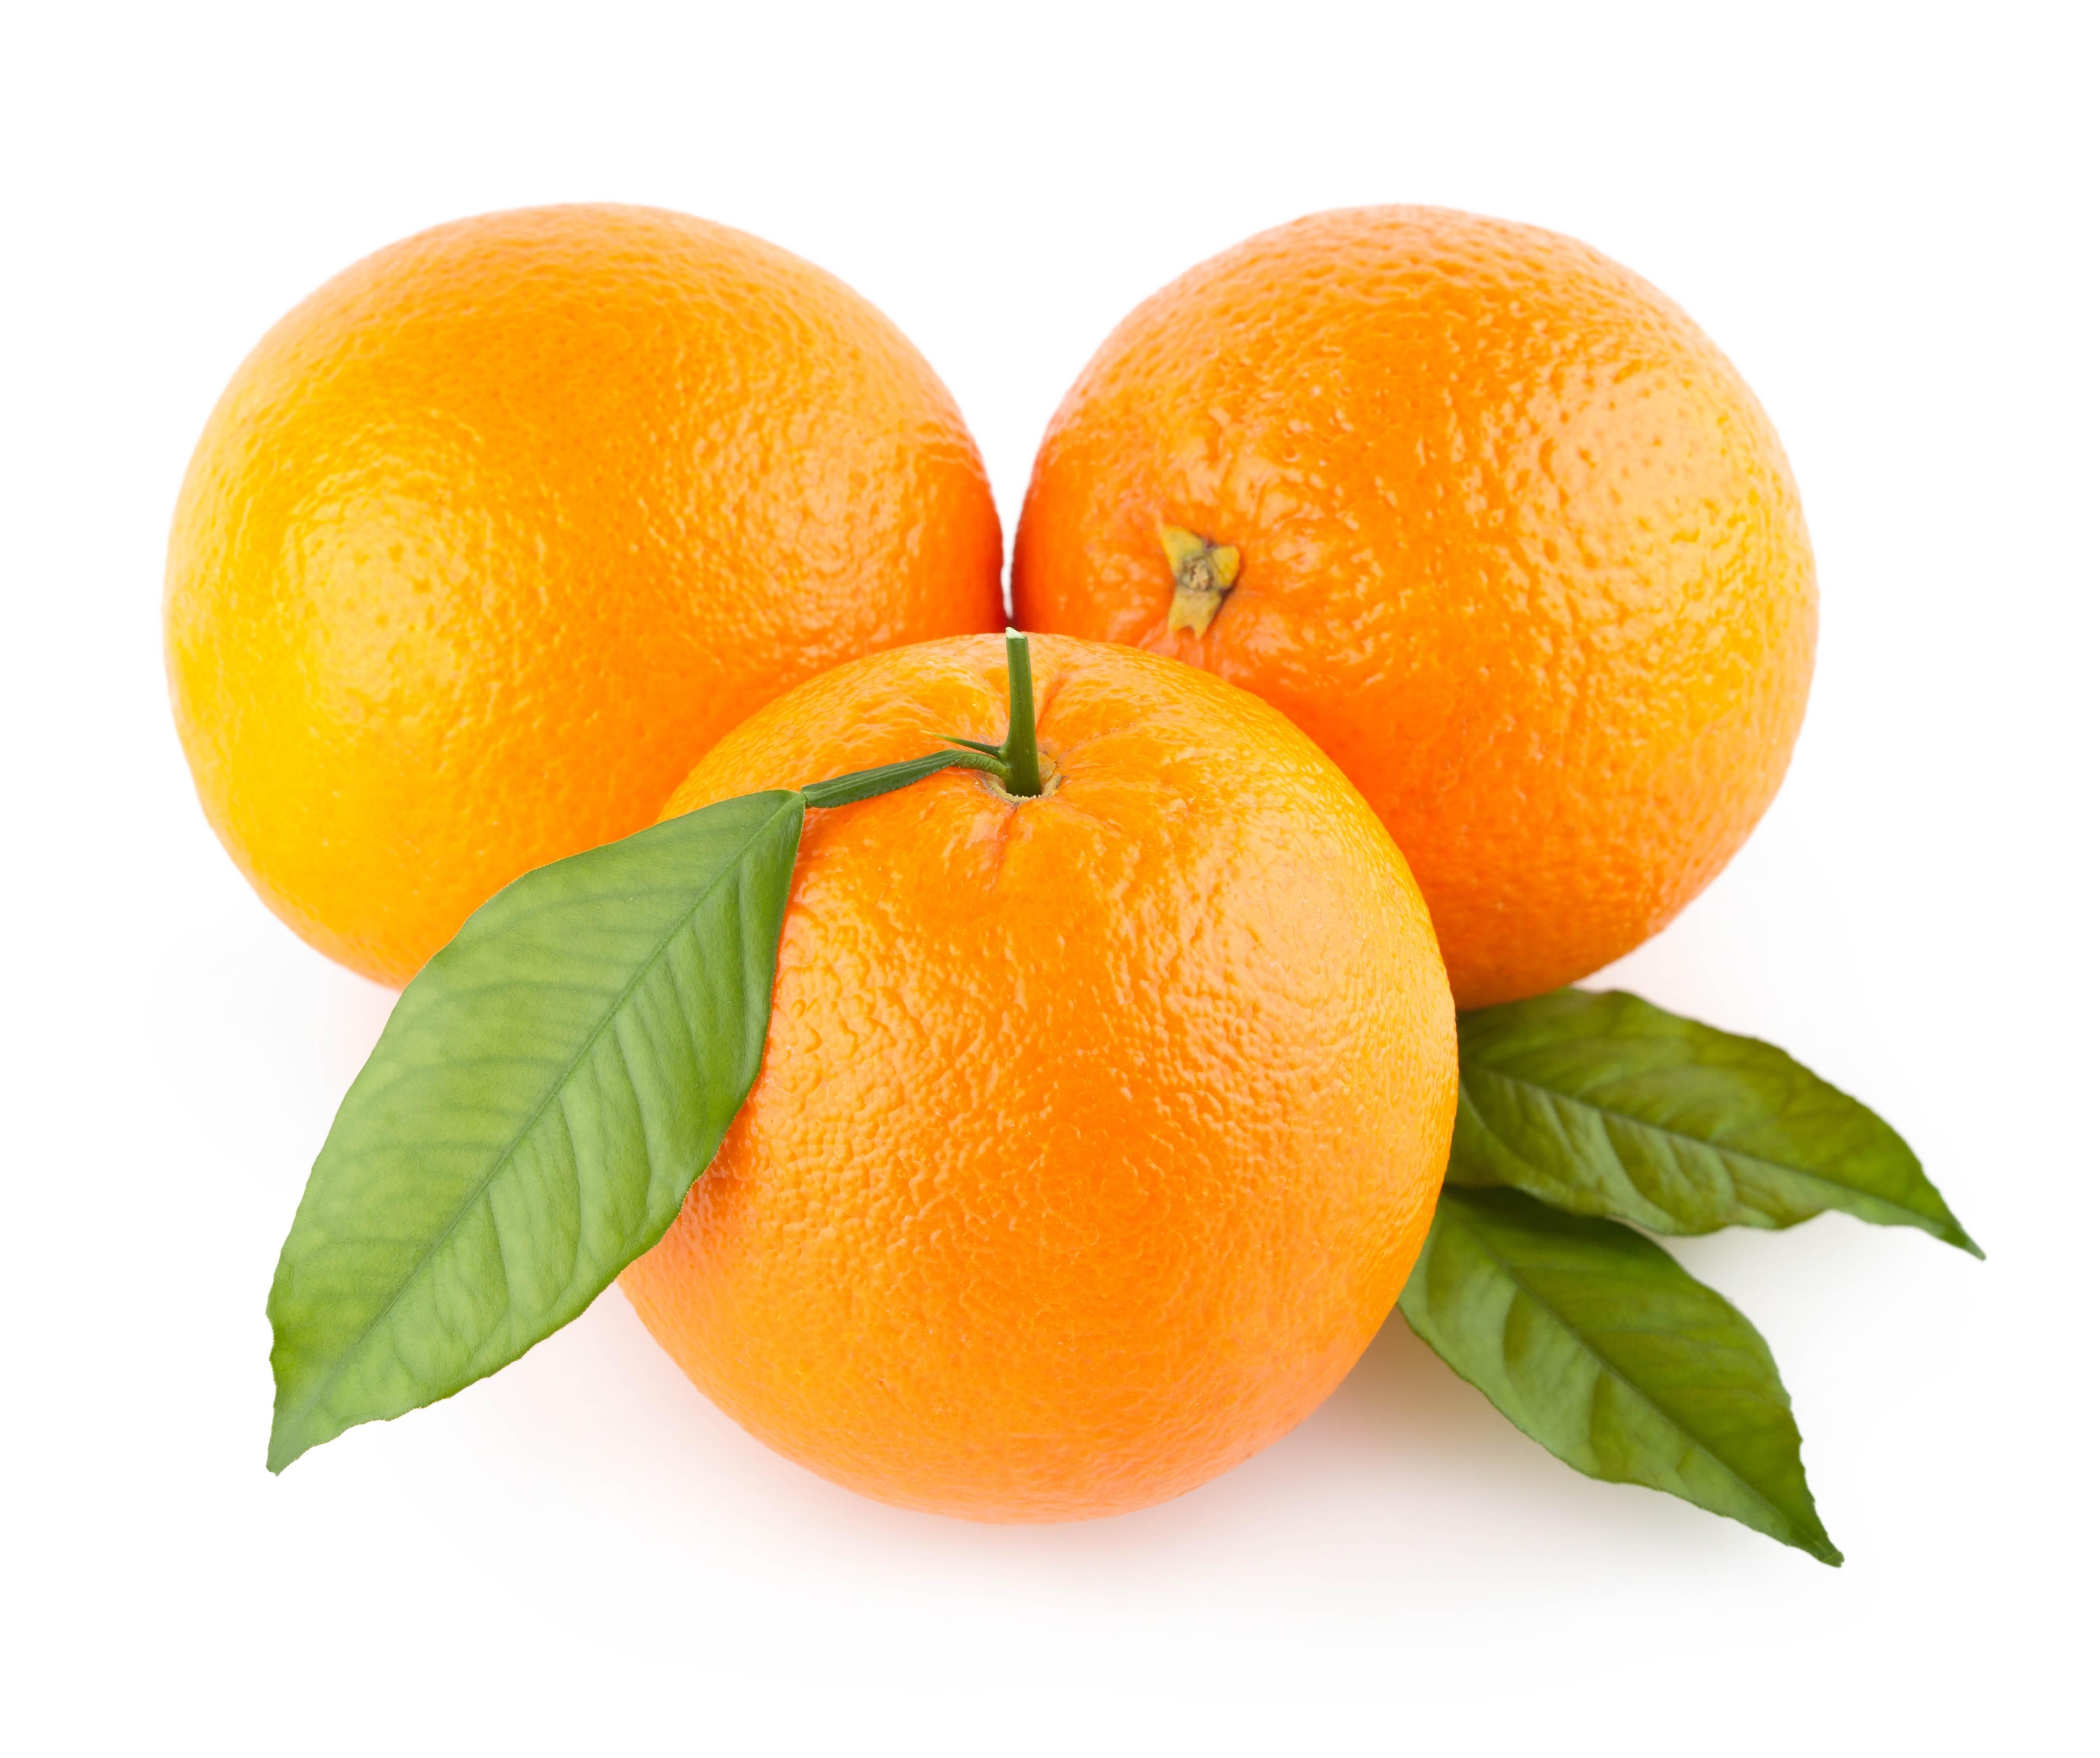 Orange Wallpaper Hd: Orange 4k Ultra HD Wallpaper And Background Image